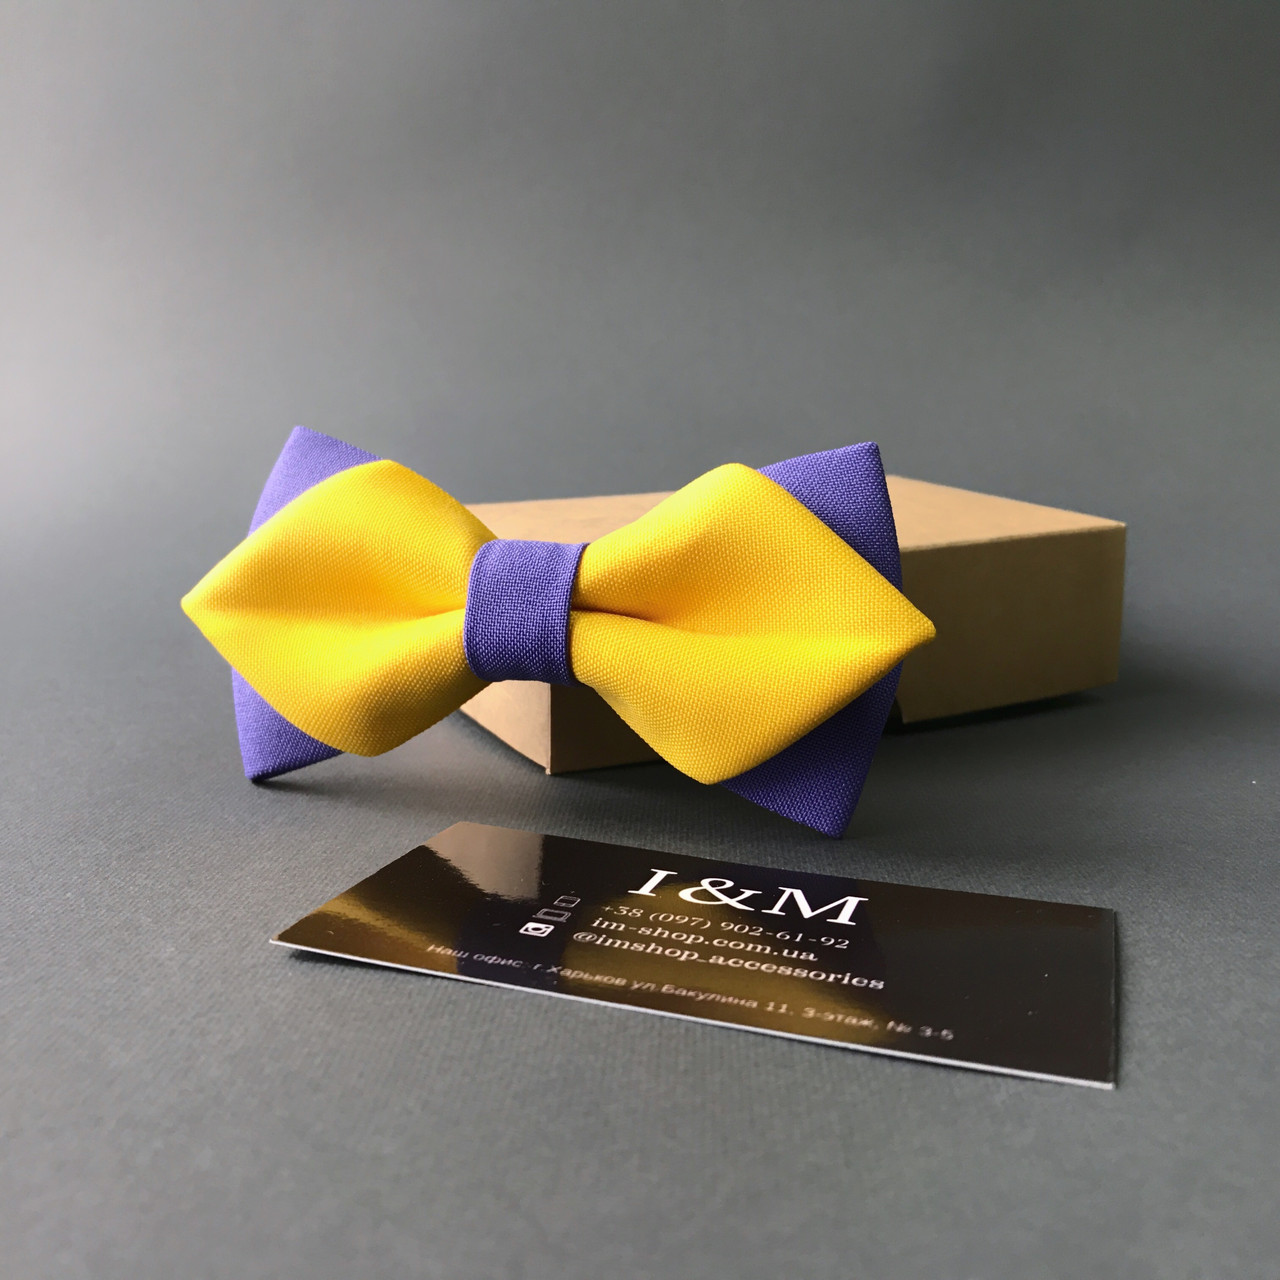 Краватка-метелик I&M Craft з гострими кінцями жовтий з лавандовим (100154N)